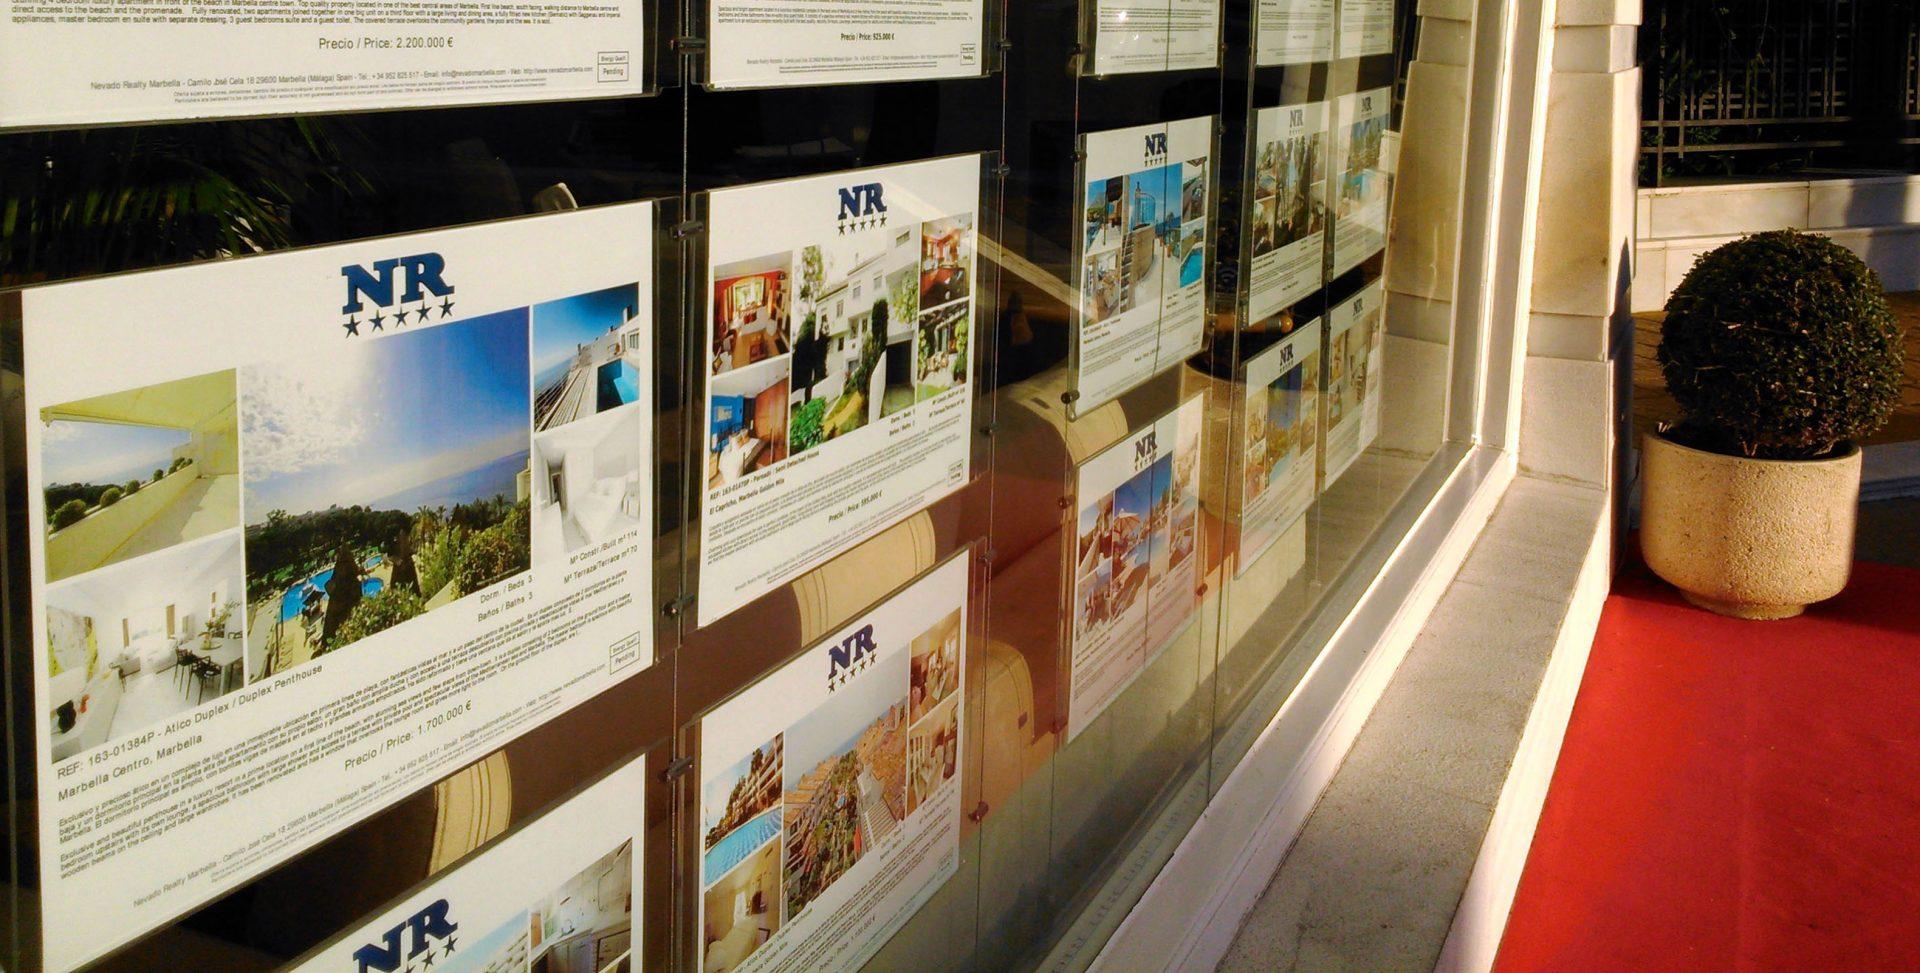 Properties in Marbella - Marbella Real Estate Agent